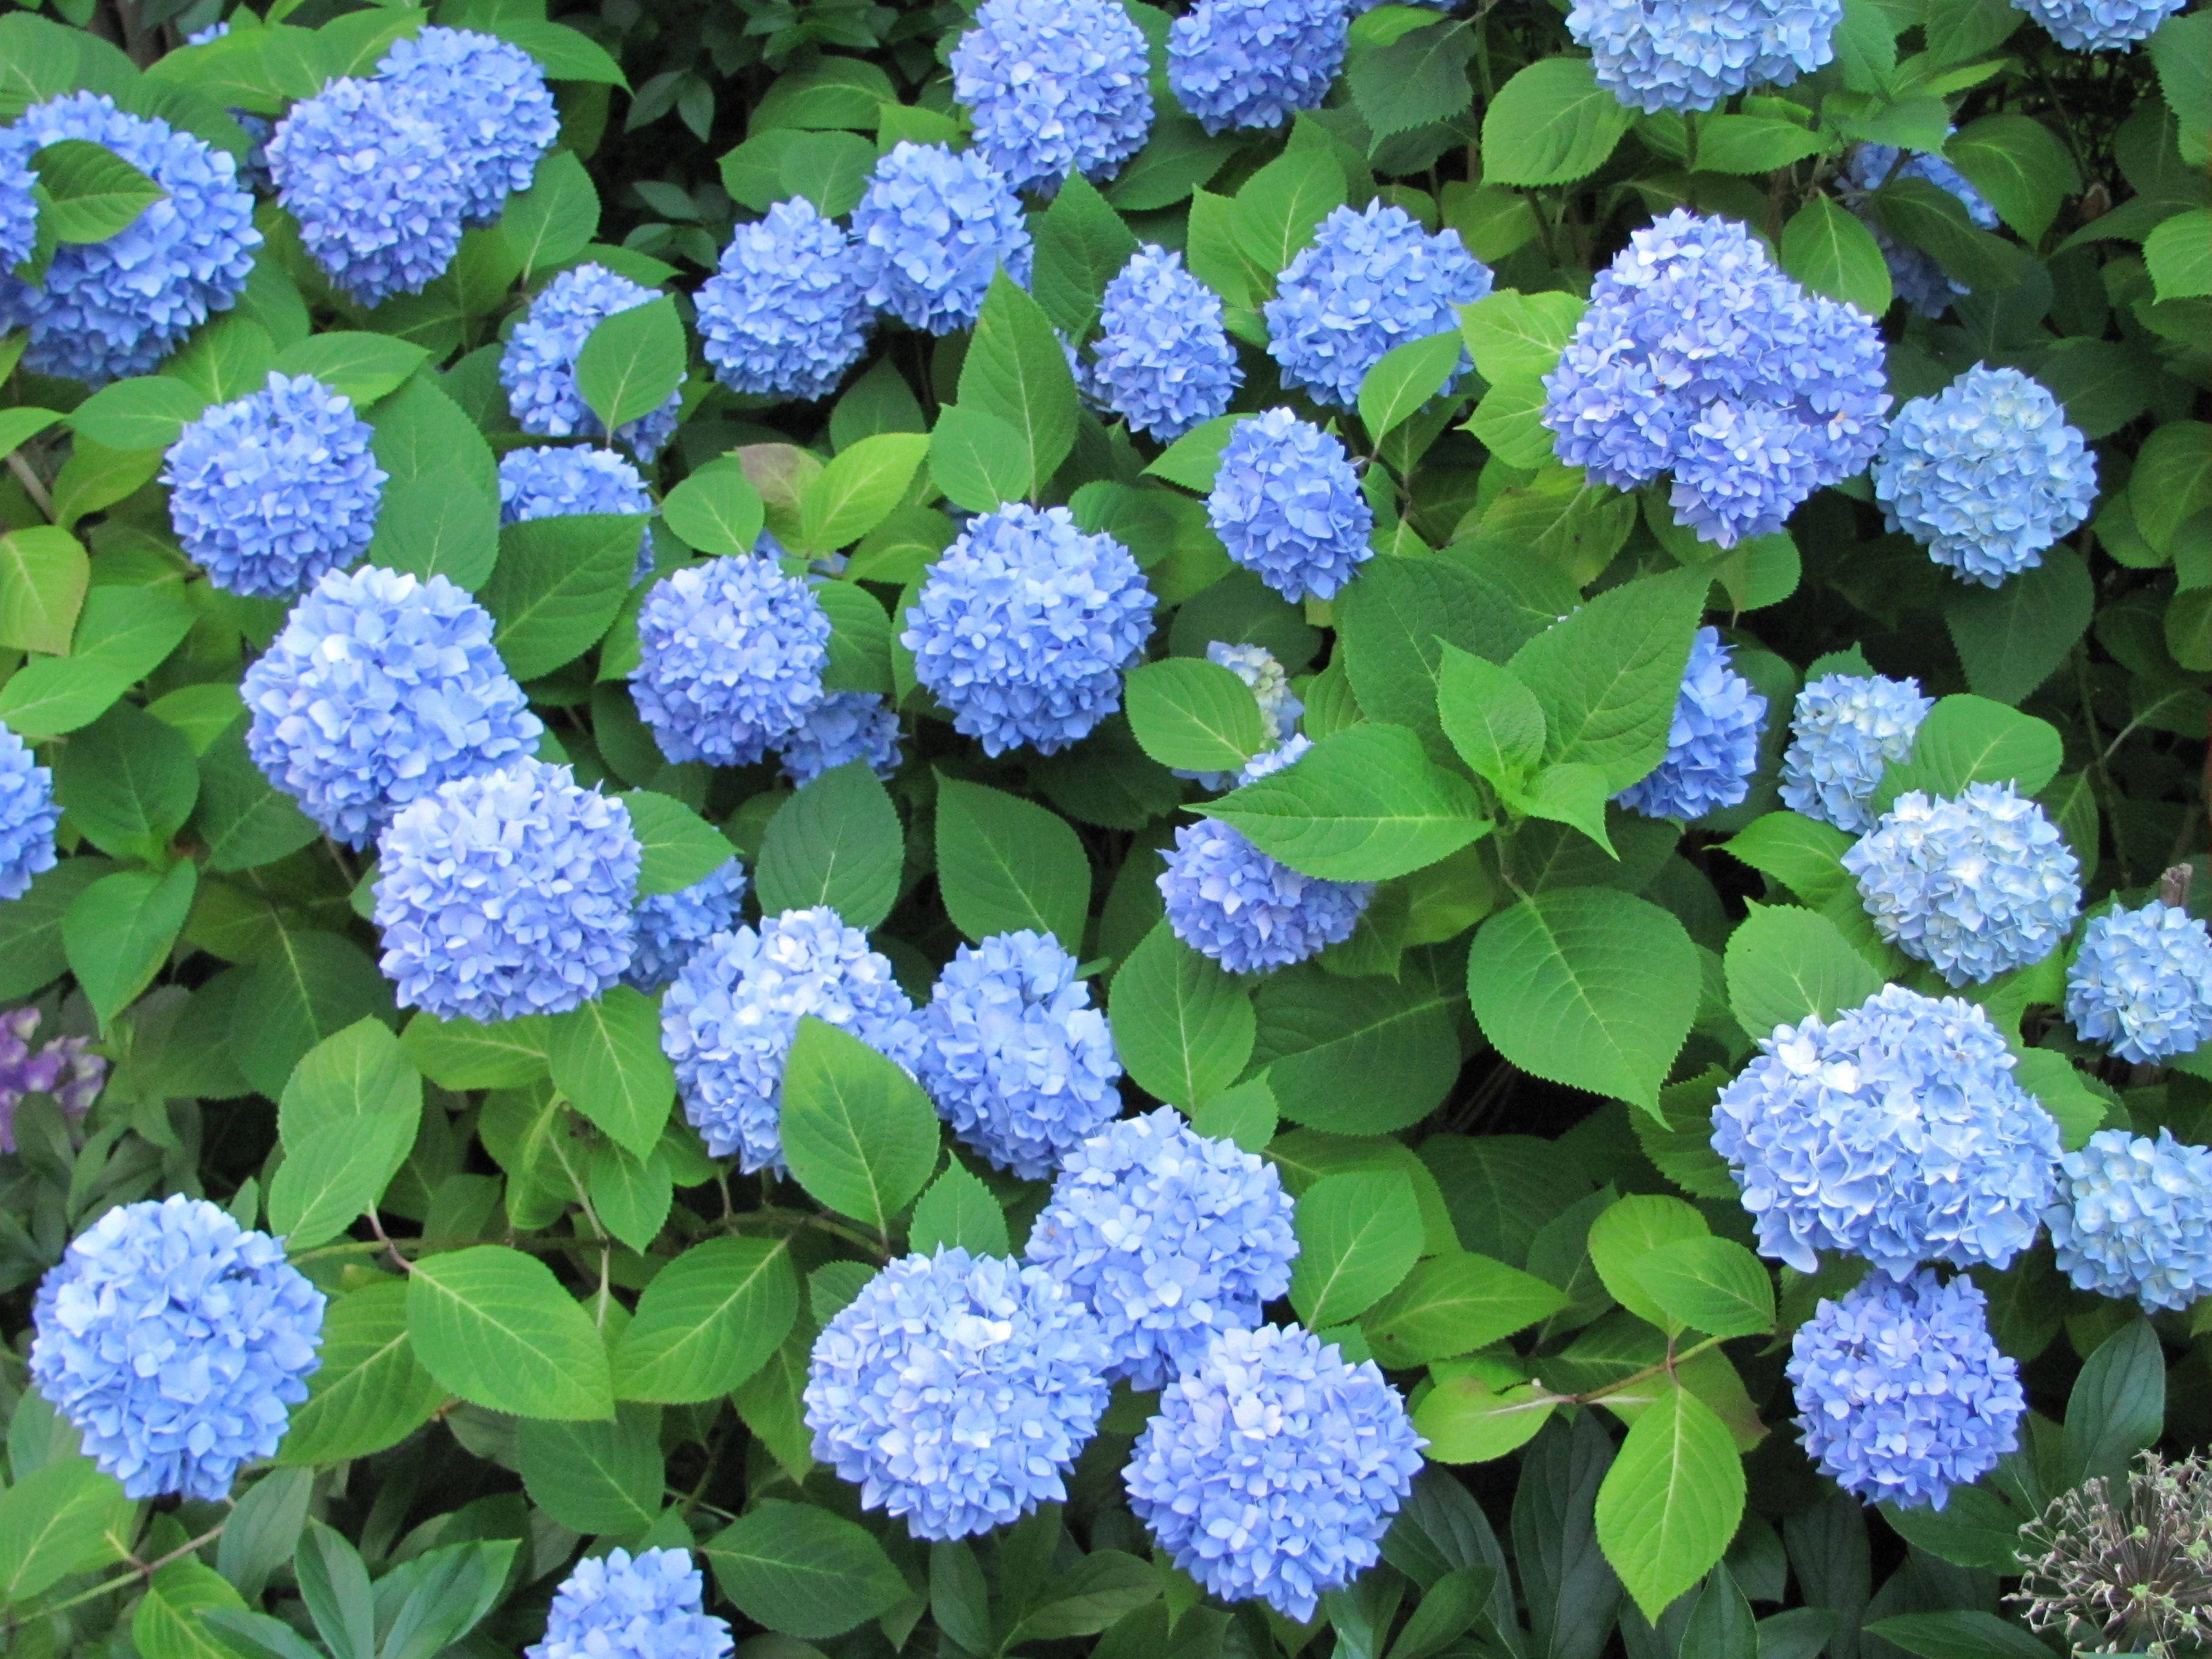 Hydrangeas Nikko Blue Hydrangea Blue Hydrangea Planting Hydrangeas